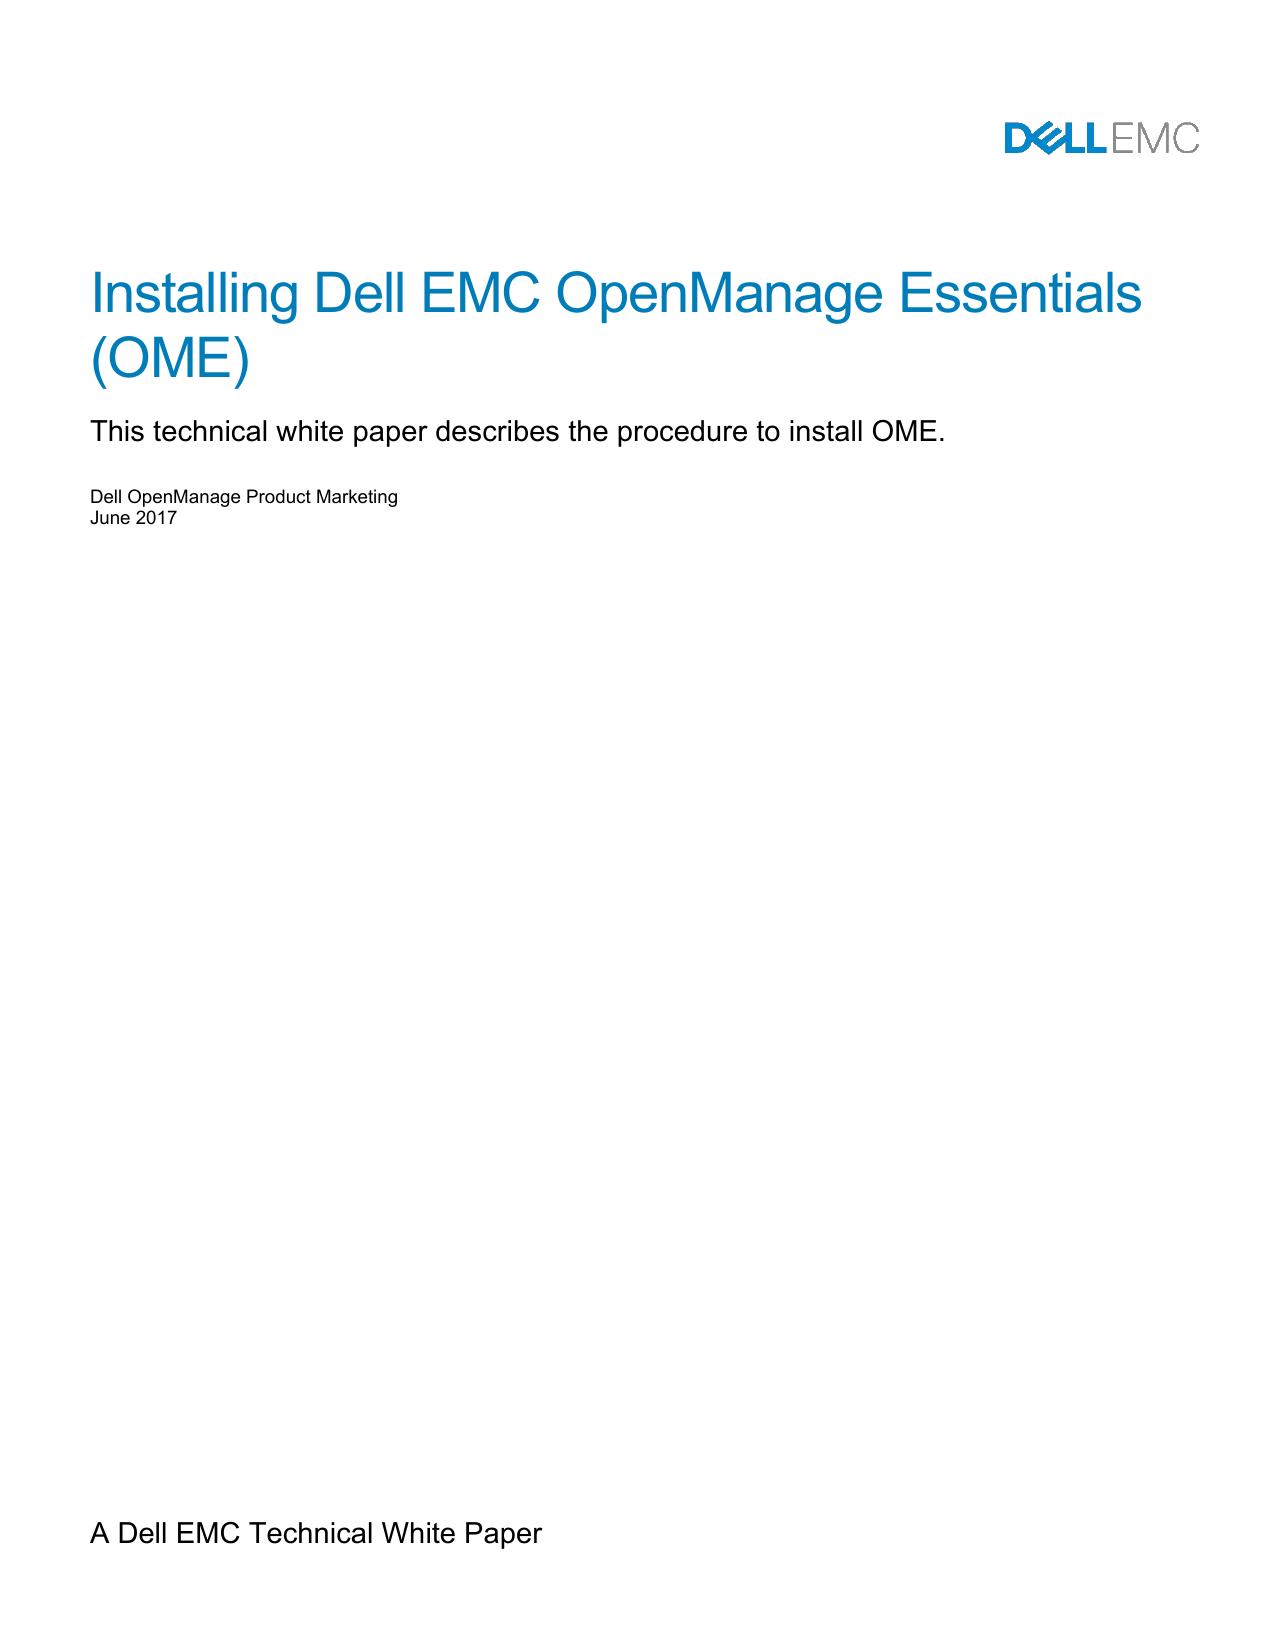 Installing Dell EMC OpenManage Essentials OME   Manualzz